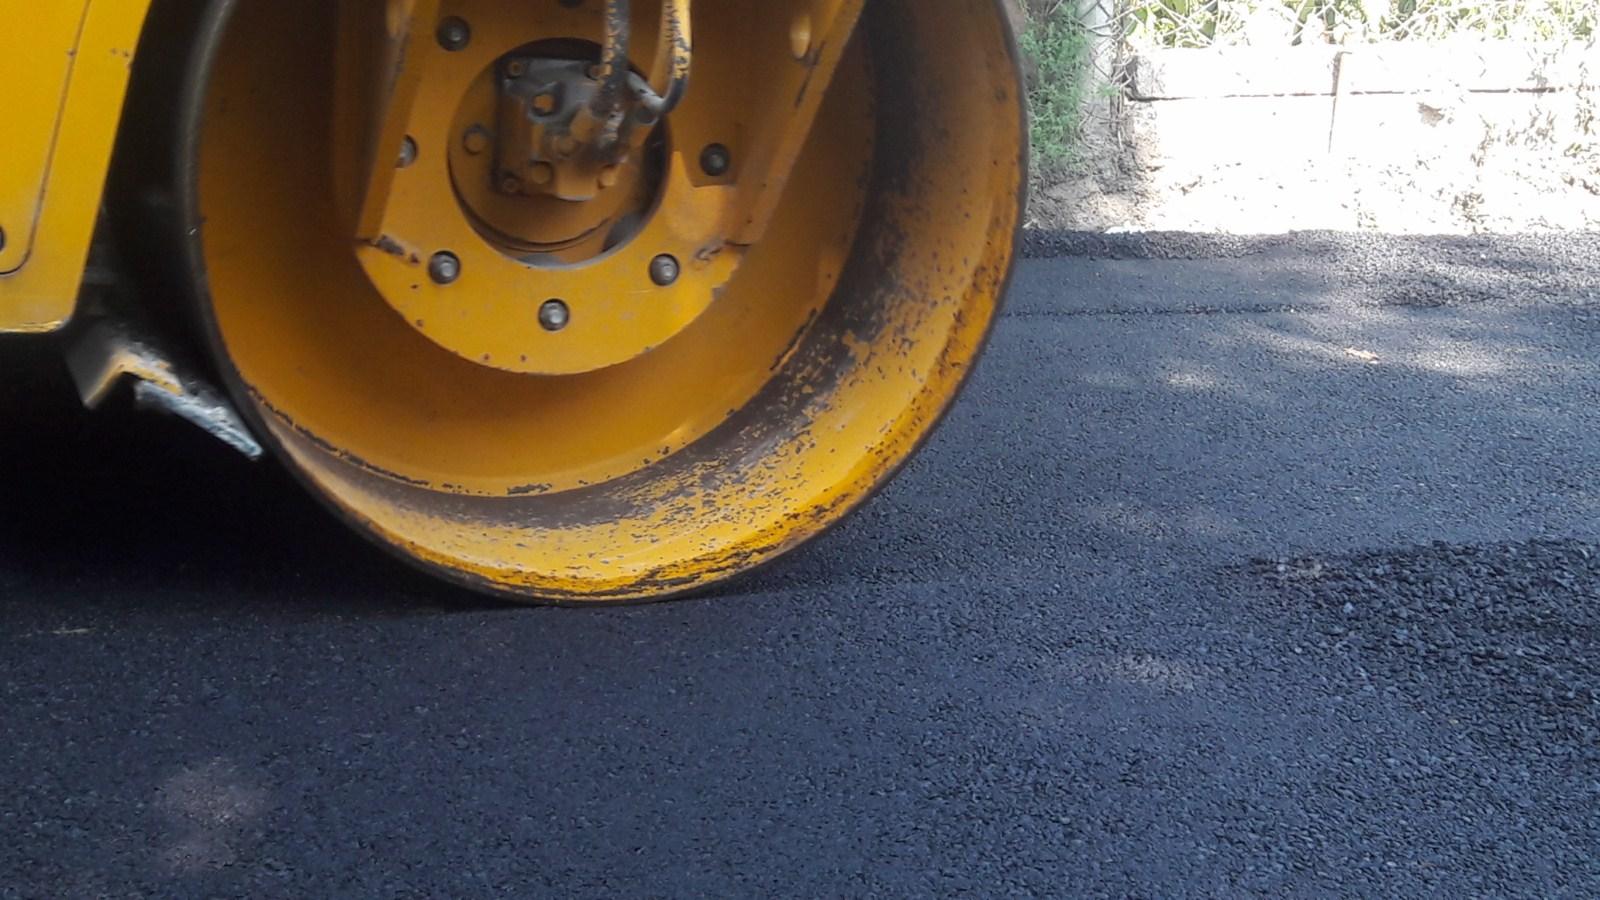 asfaltare izmail (2) [1600x1200]